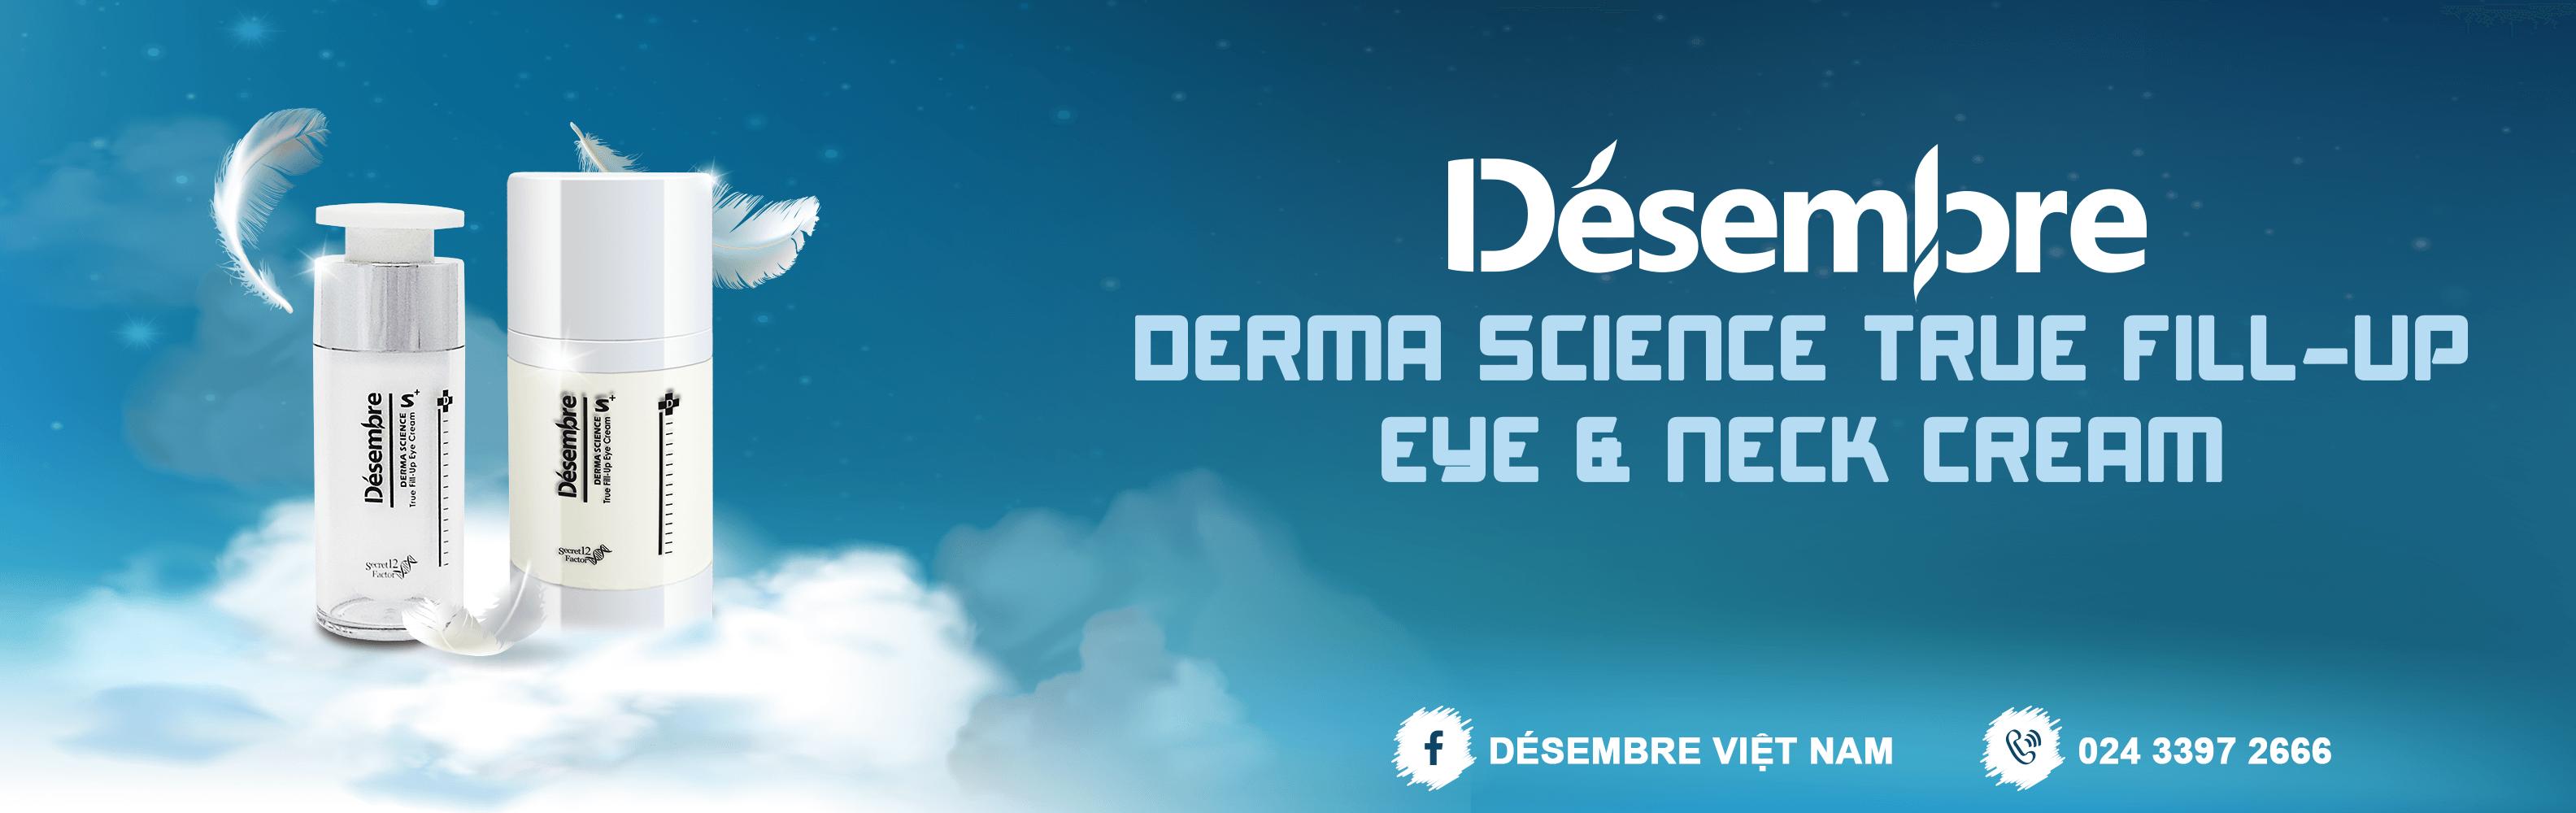 DÉSEMBRE DERMA SCIENCE TRUE FILL-UP EYE & NECK CREAM